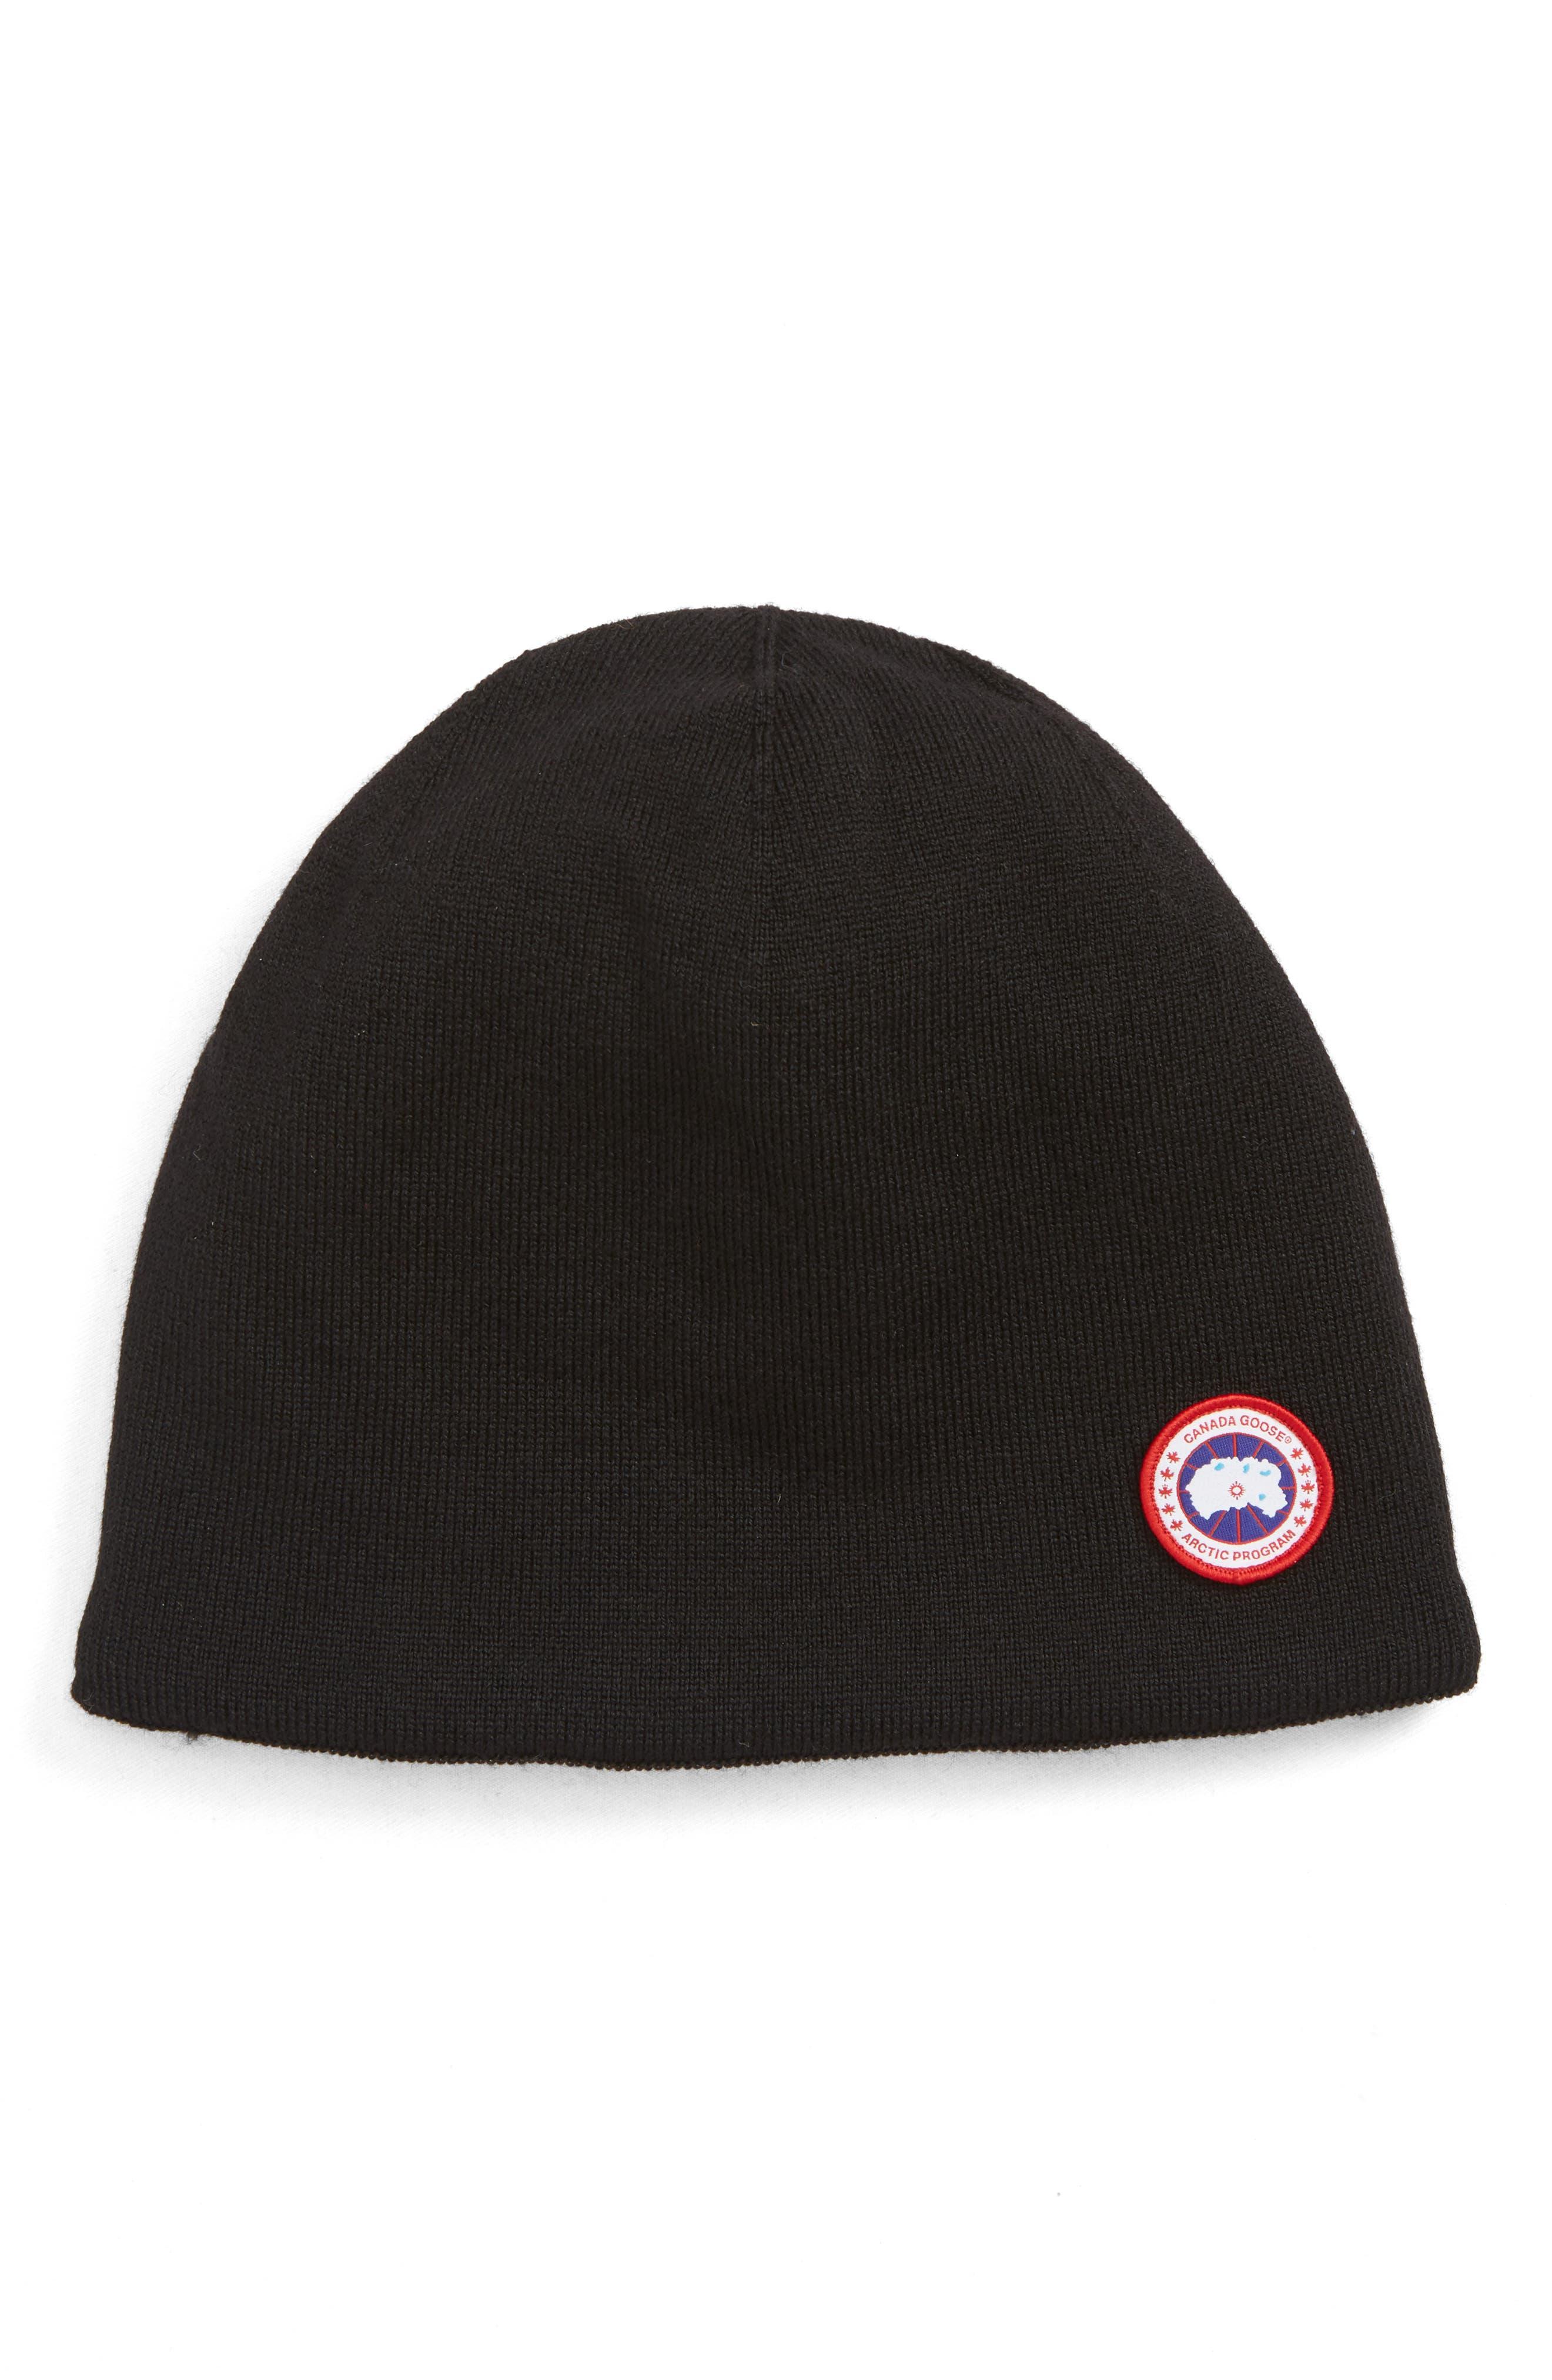 CANADA GOOSE, Standard Wool Blend Beanie, Main thumbnail 1, color, BLACK